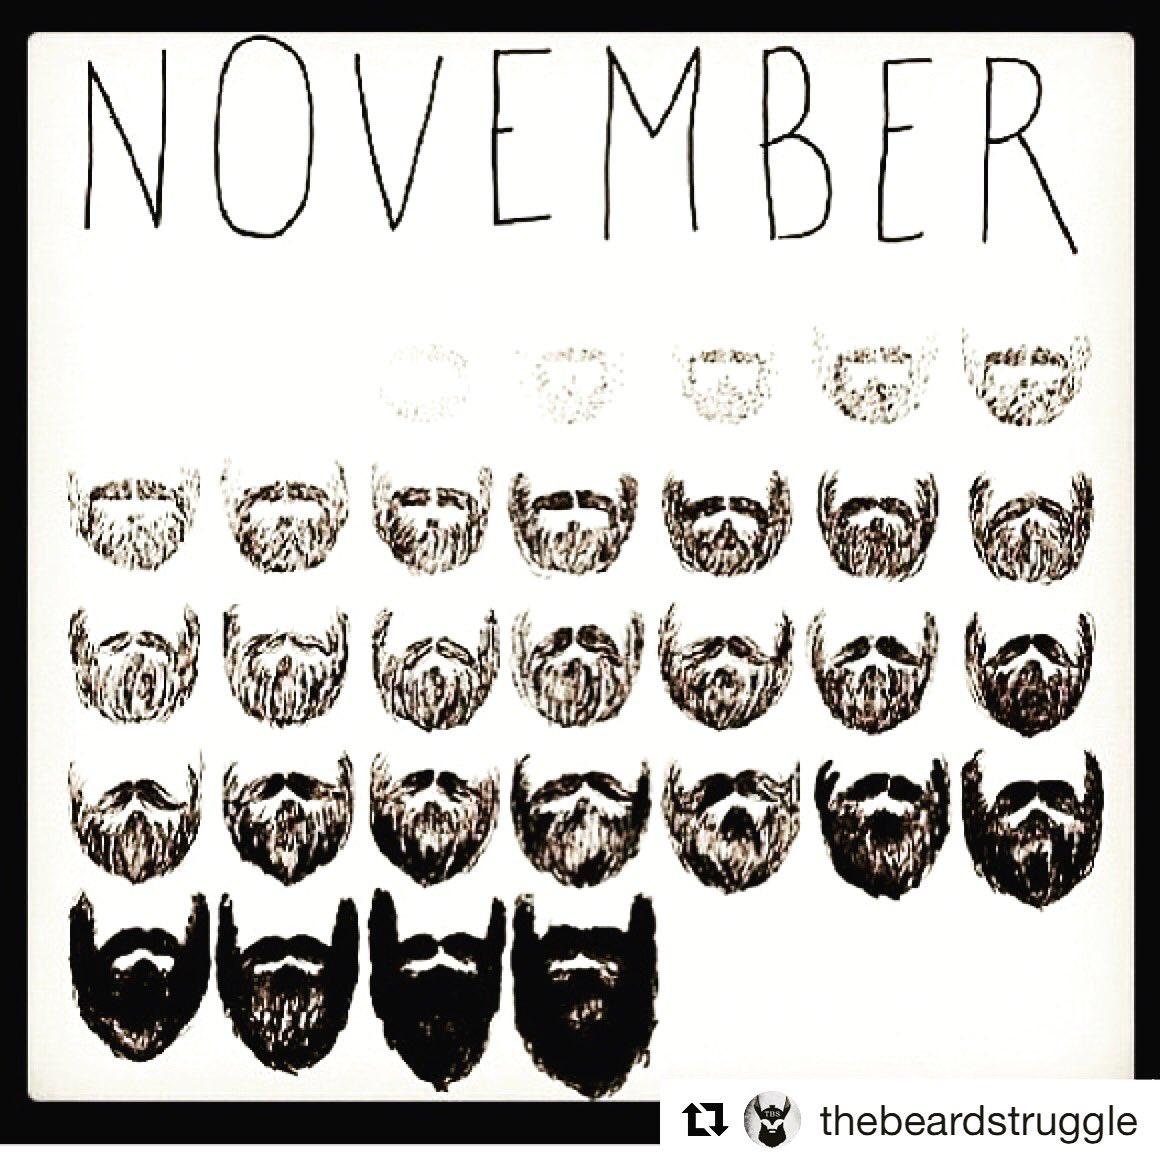 After pink October ..Novembeard..#octobrerose #novembre #breastcancer #BEARD #chirurgie #barbu <br>http://pic.twitter.com/W5fdyOejbb